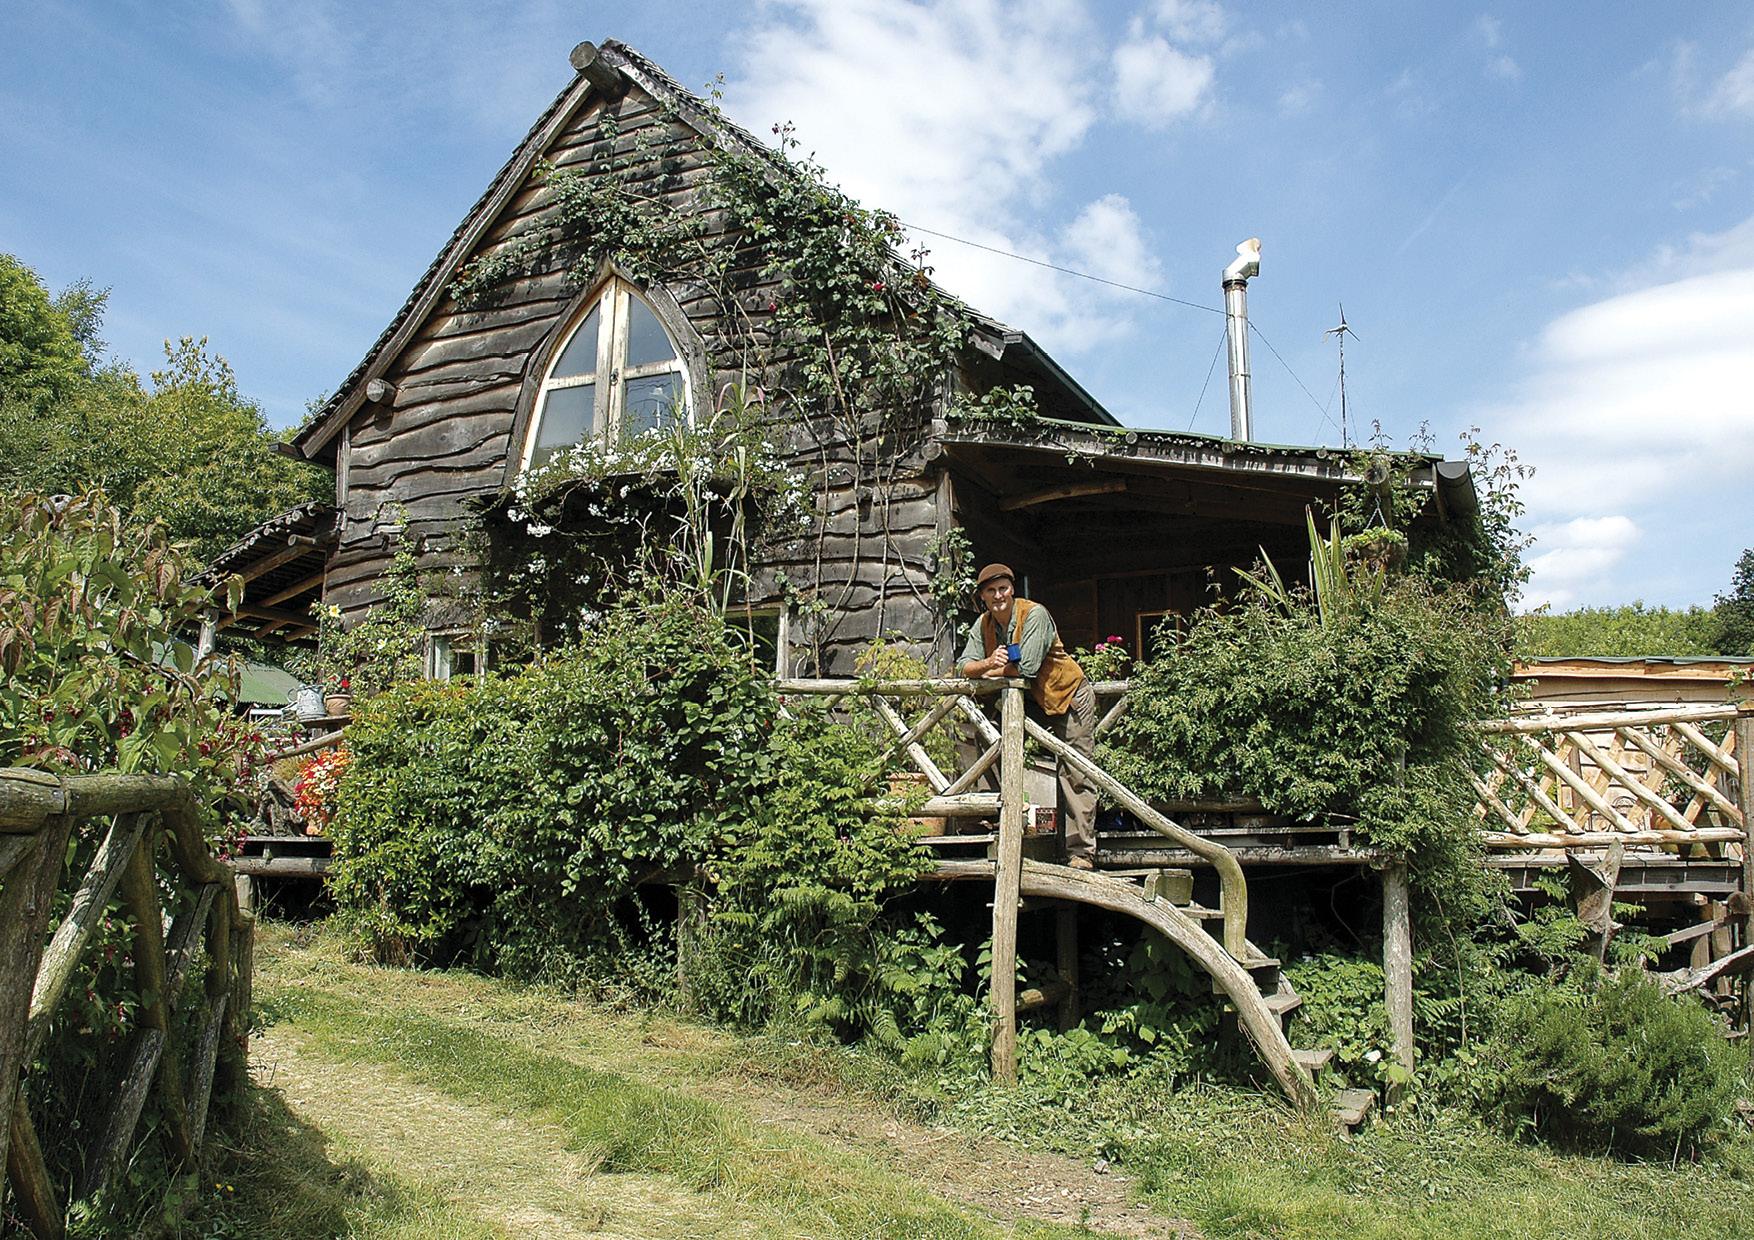 Principle 3: Obtain a yield - A woodlands home